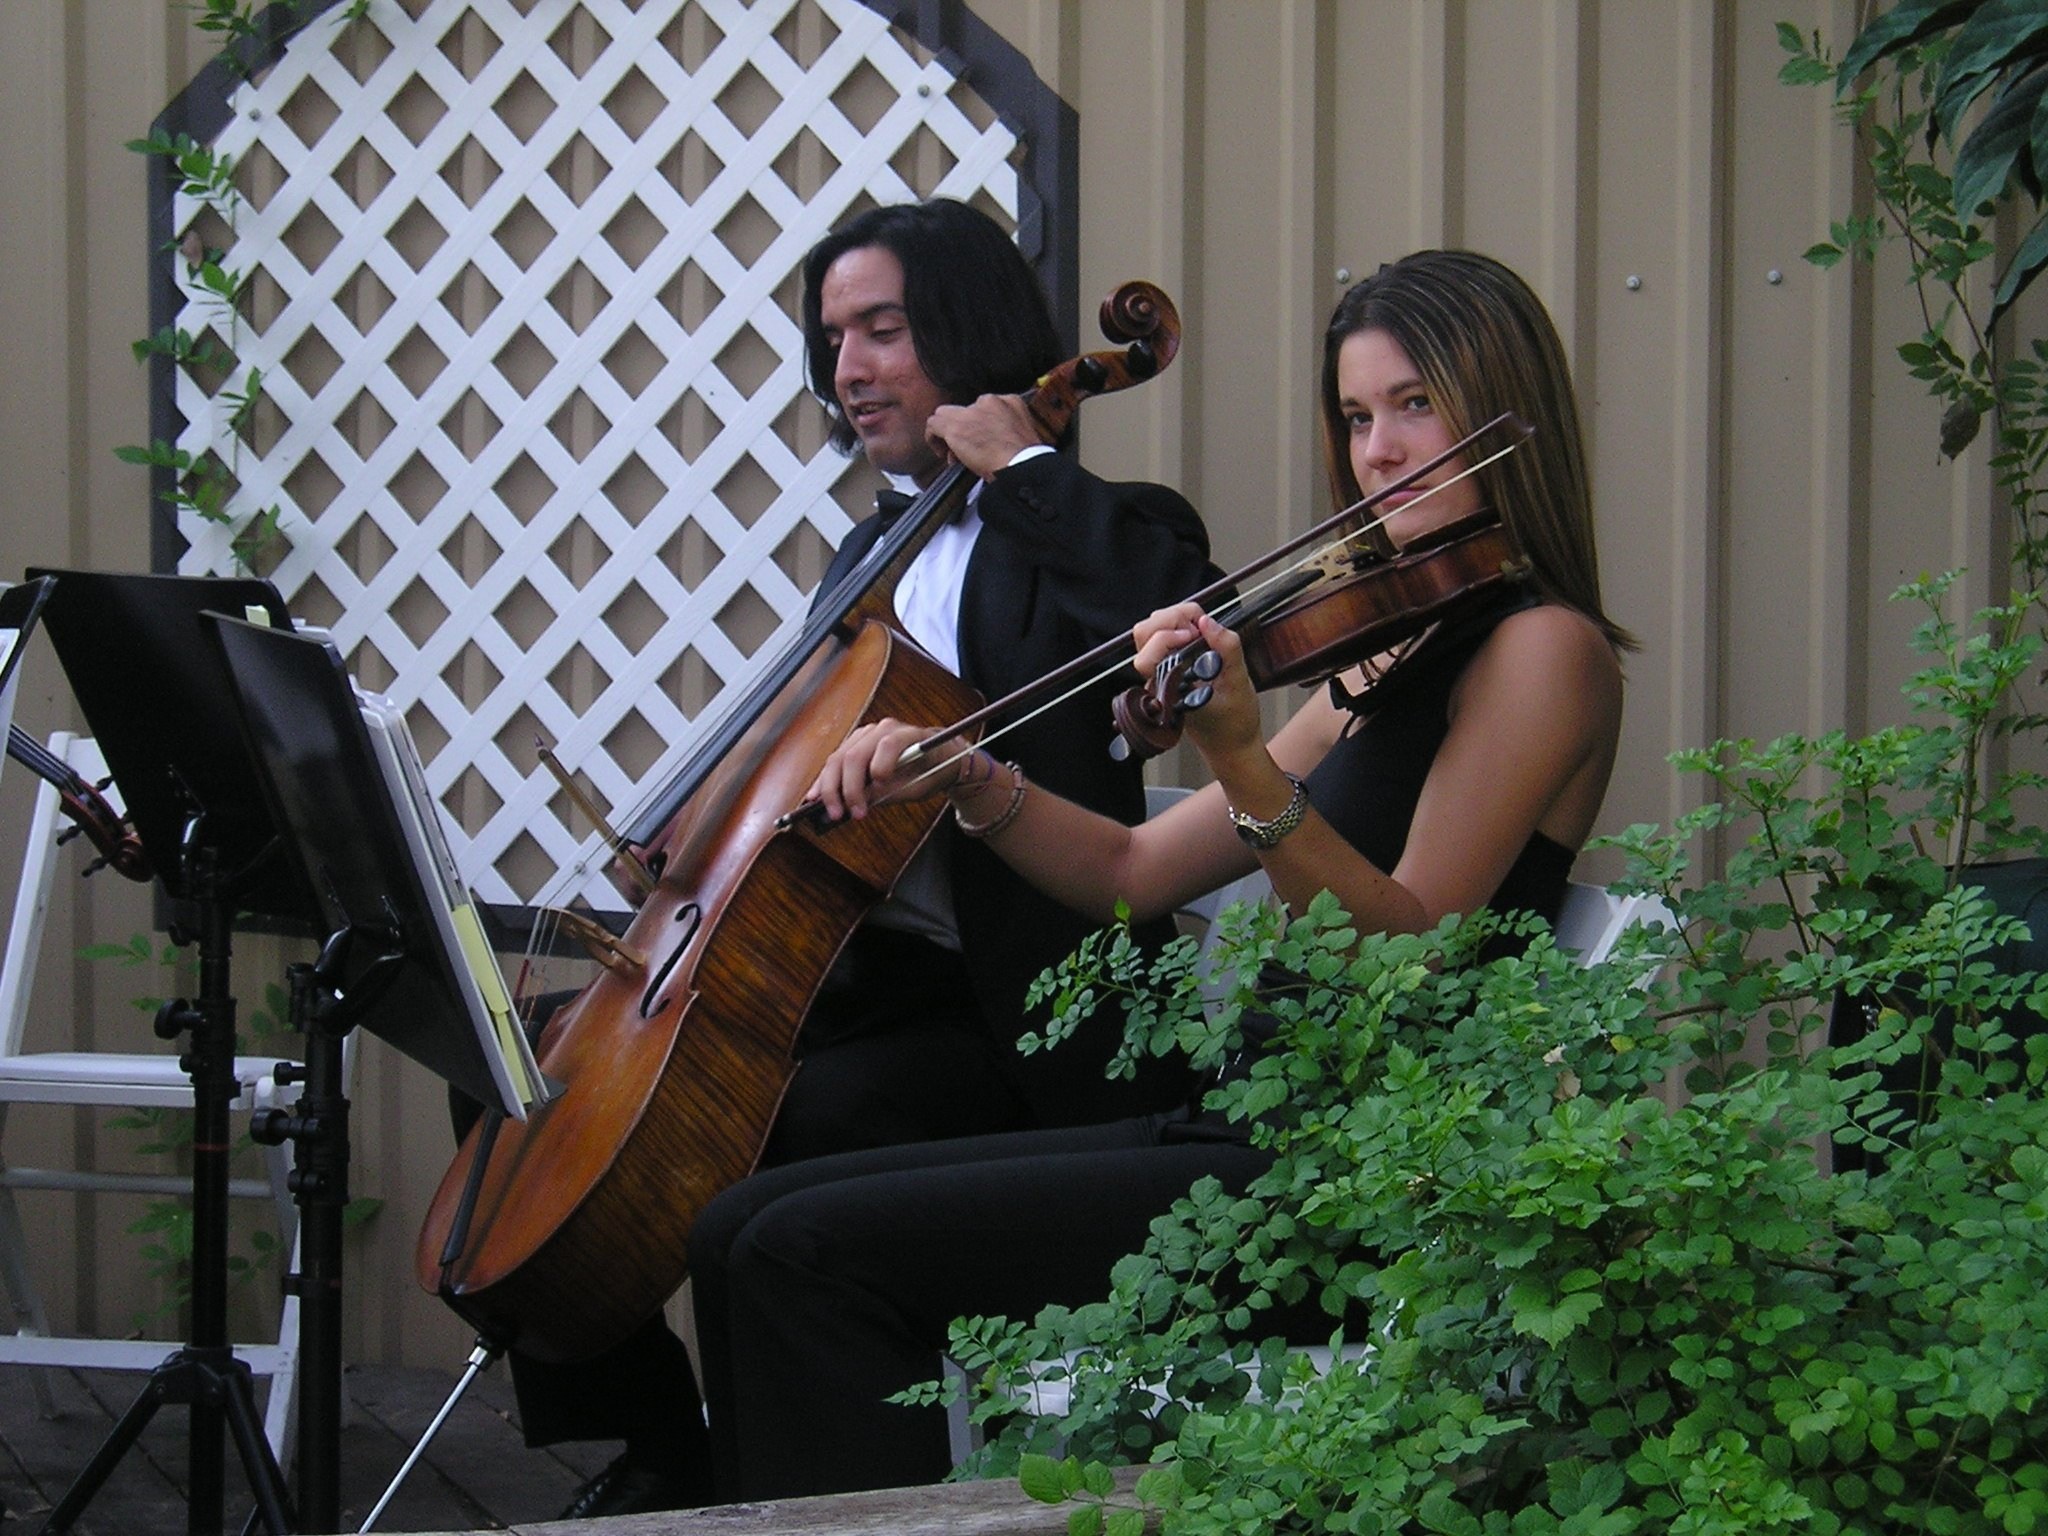 https://0201.nccdn.net/4_2/000/000/046/6ea/Cello---Viola-2048x1536.jpg